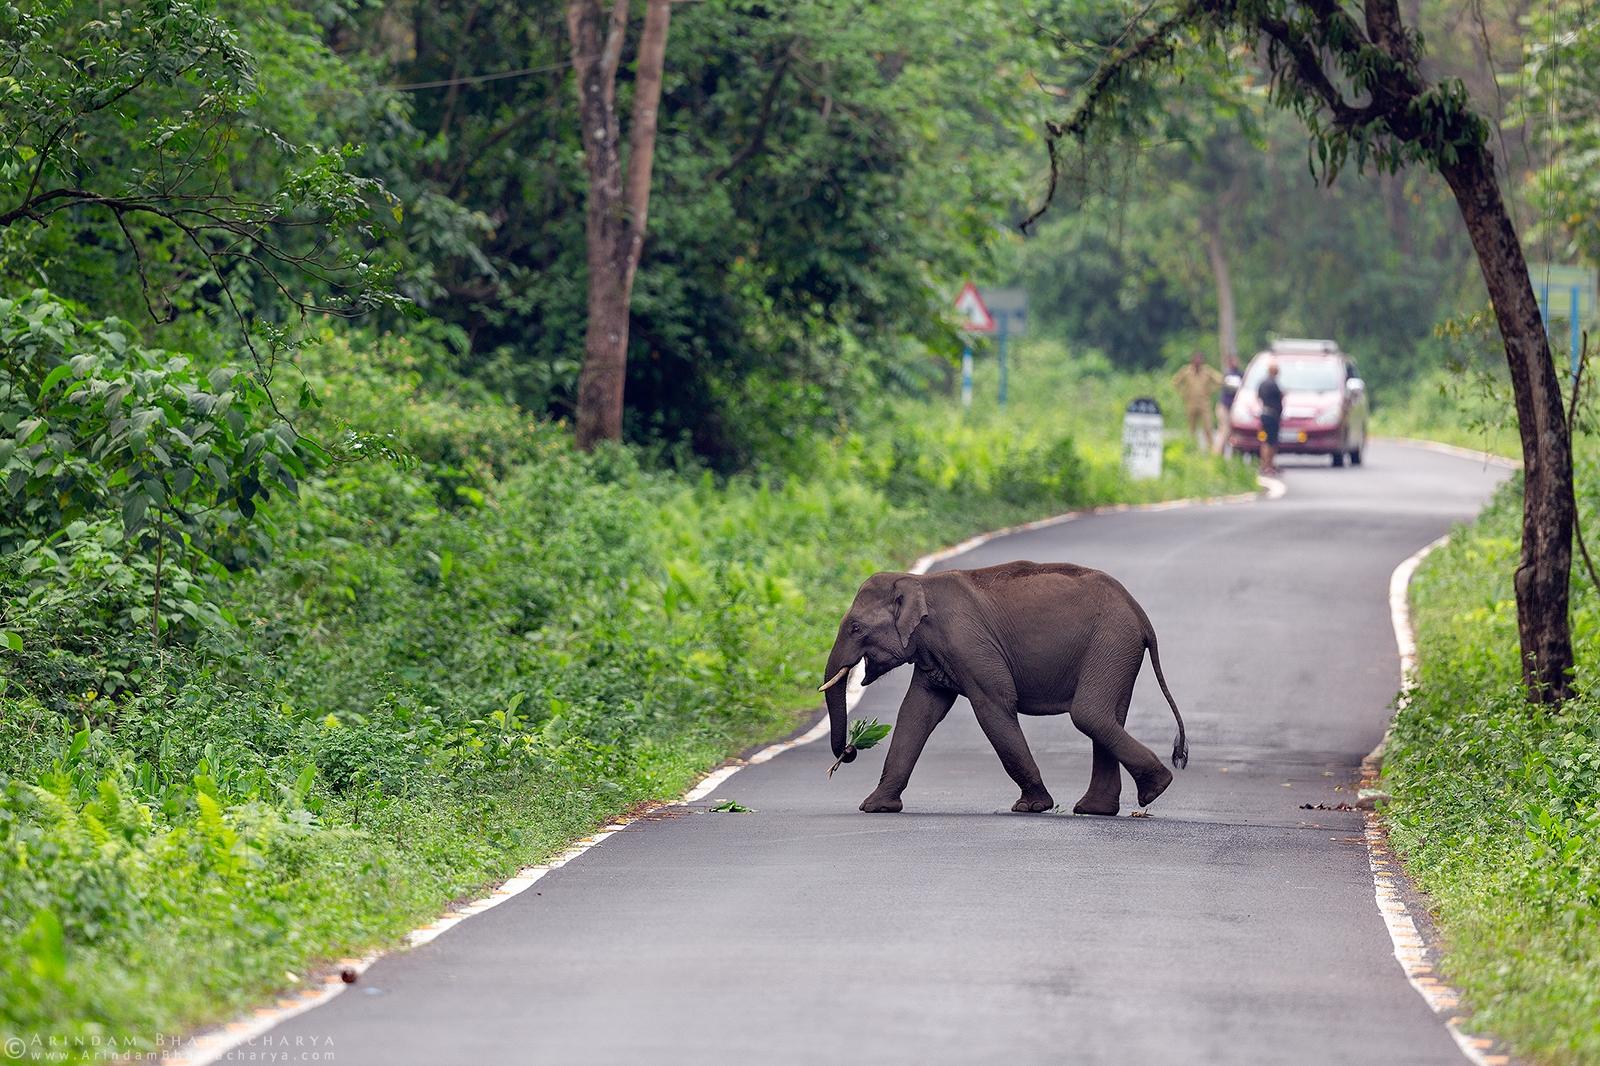 Asian elephant or Asiatic elephant or Elephas maximus crossing road at Gorumara National park West Bengal India Arindam Bhattacharya